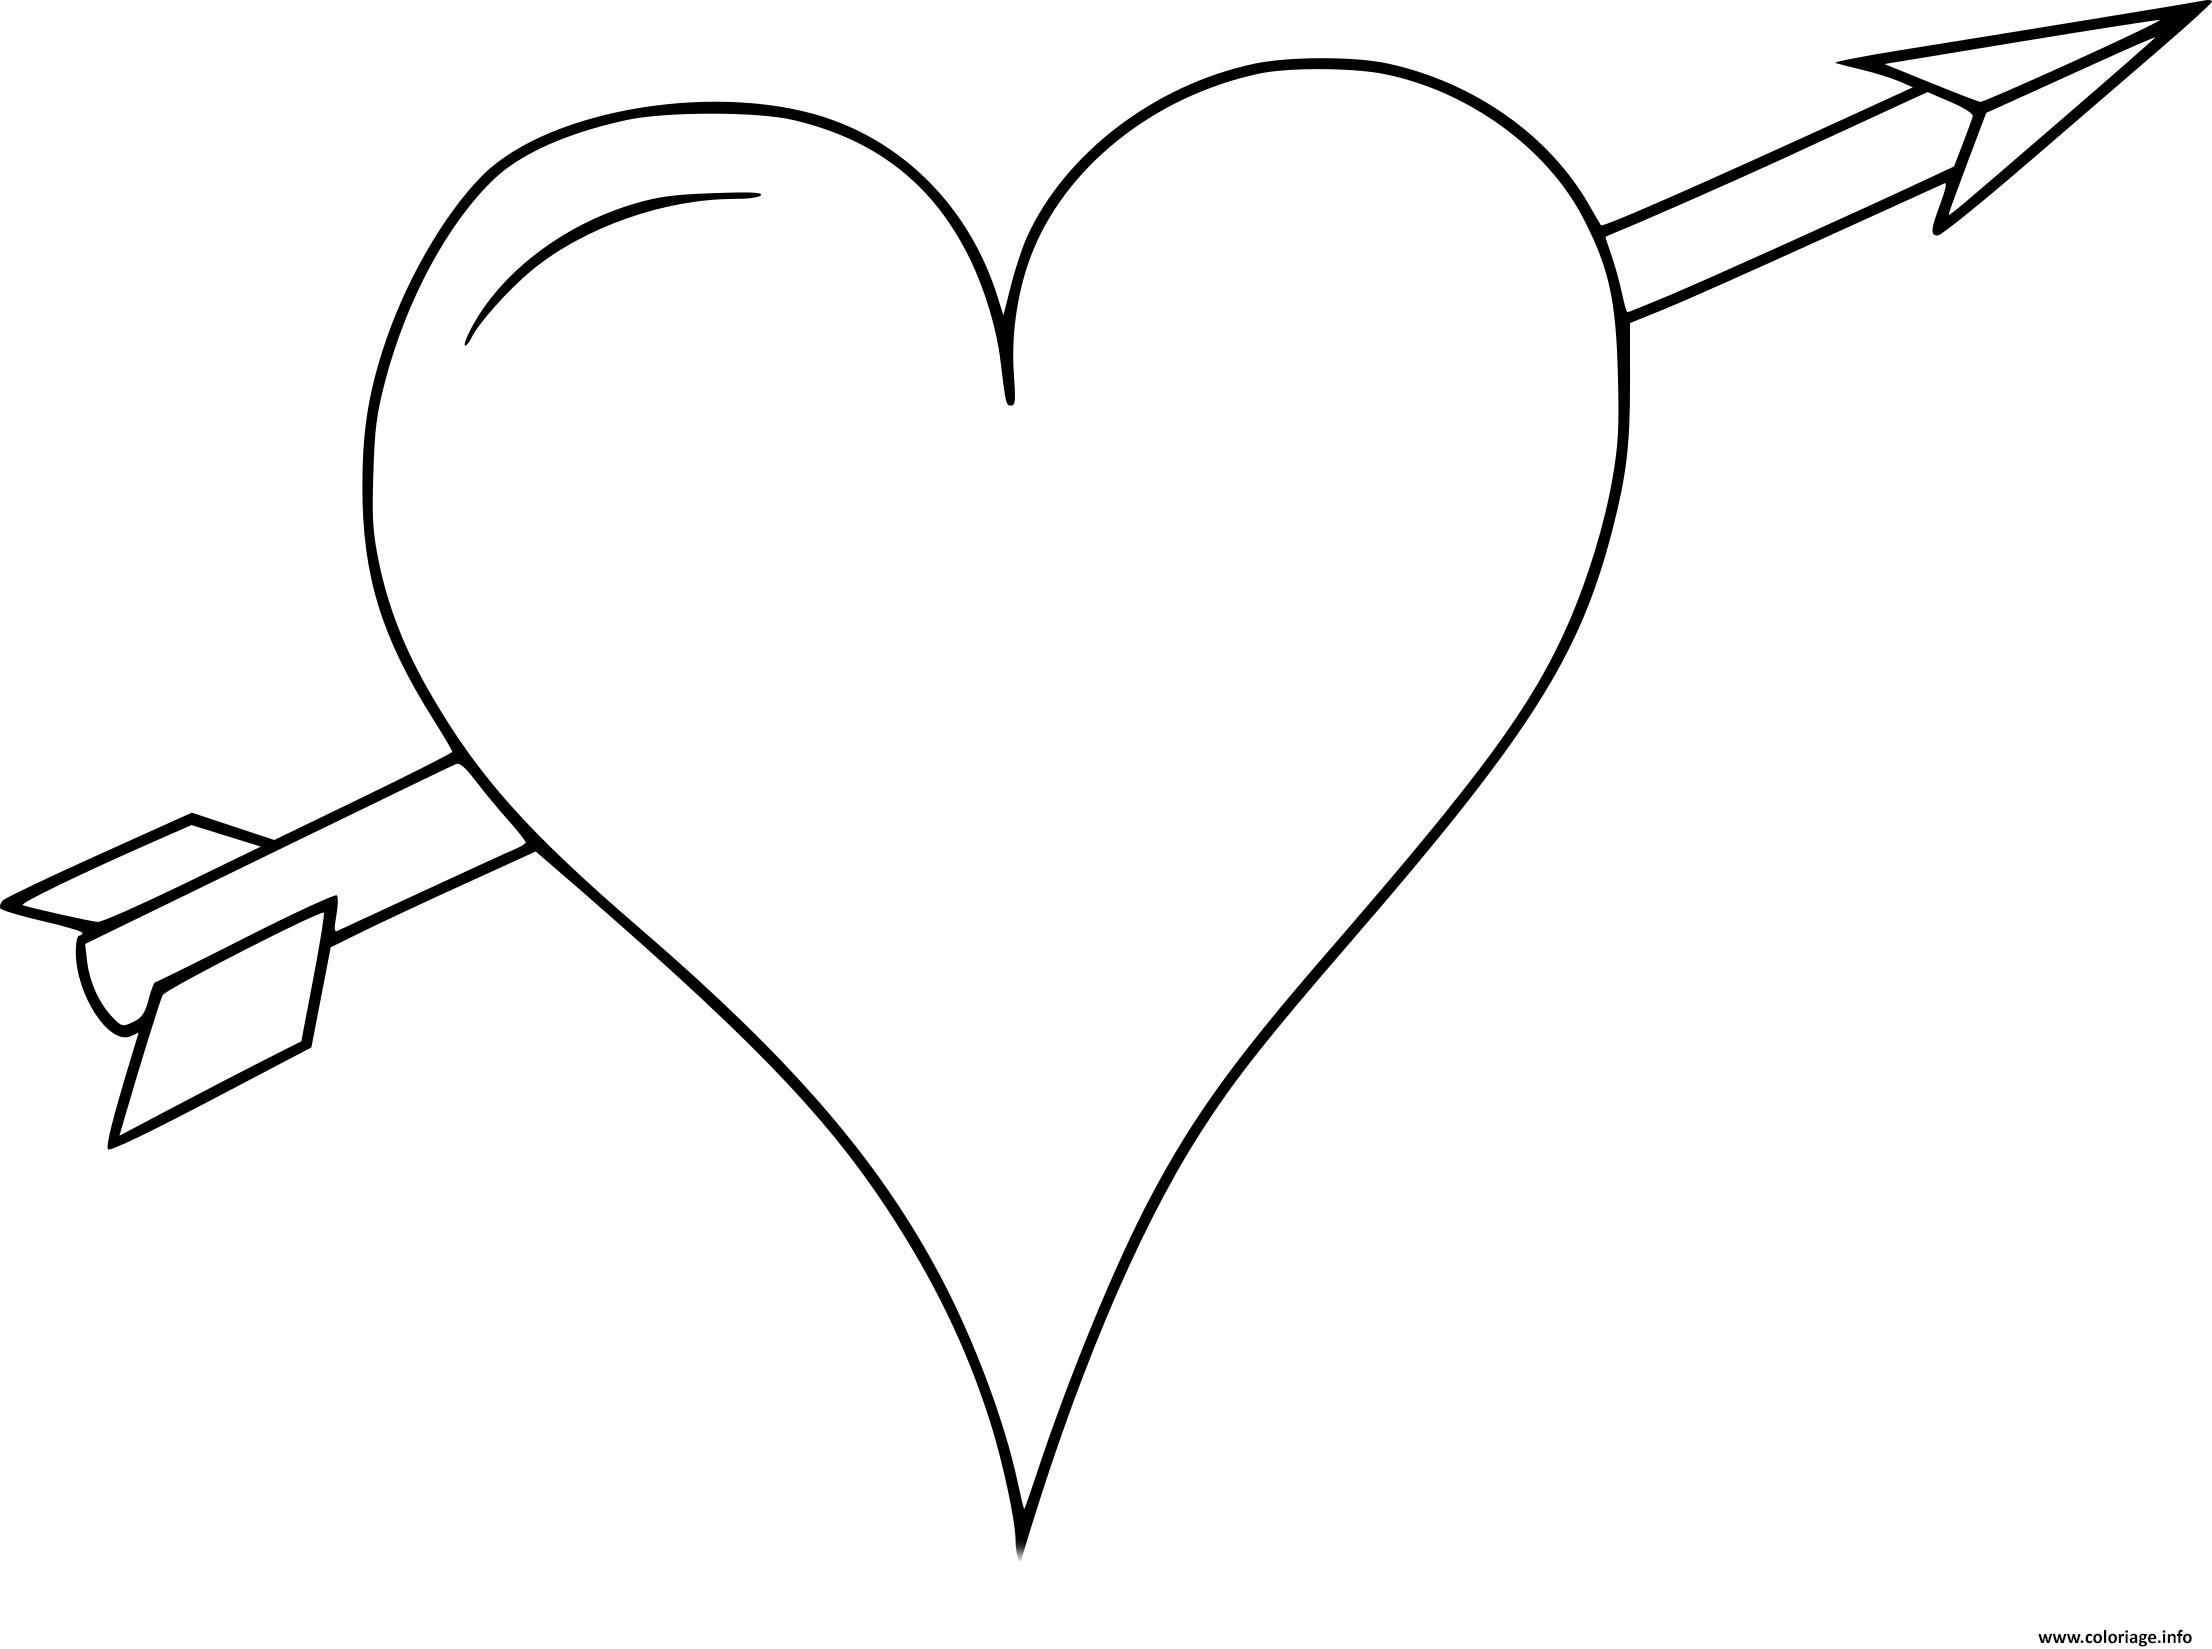 coloriage dessin coeur avec une fleche dessin. Black Bedroom Furniture Sets. Home Design Ideas